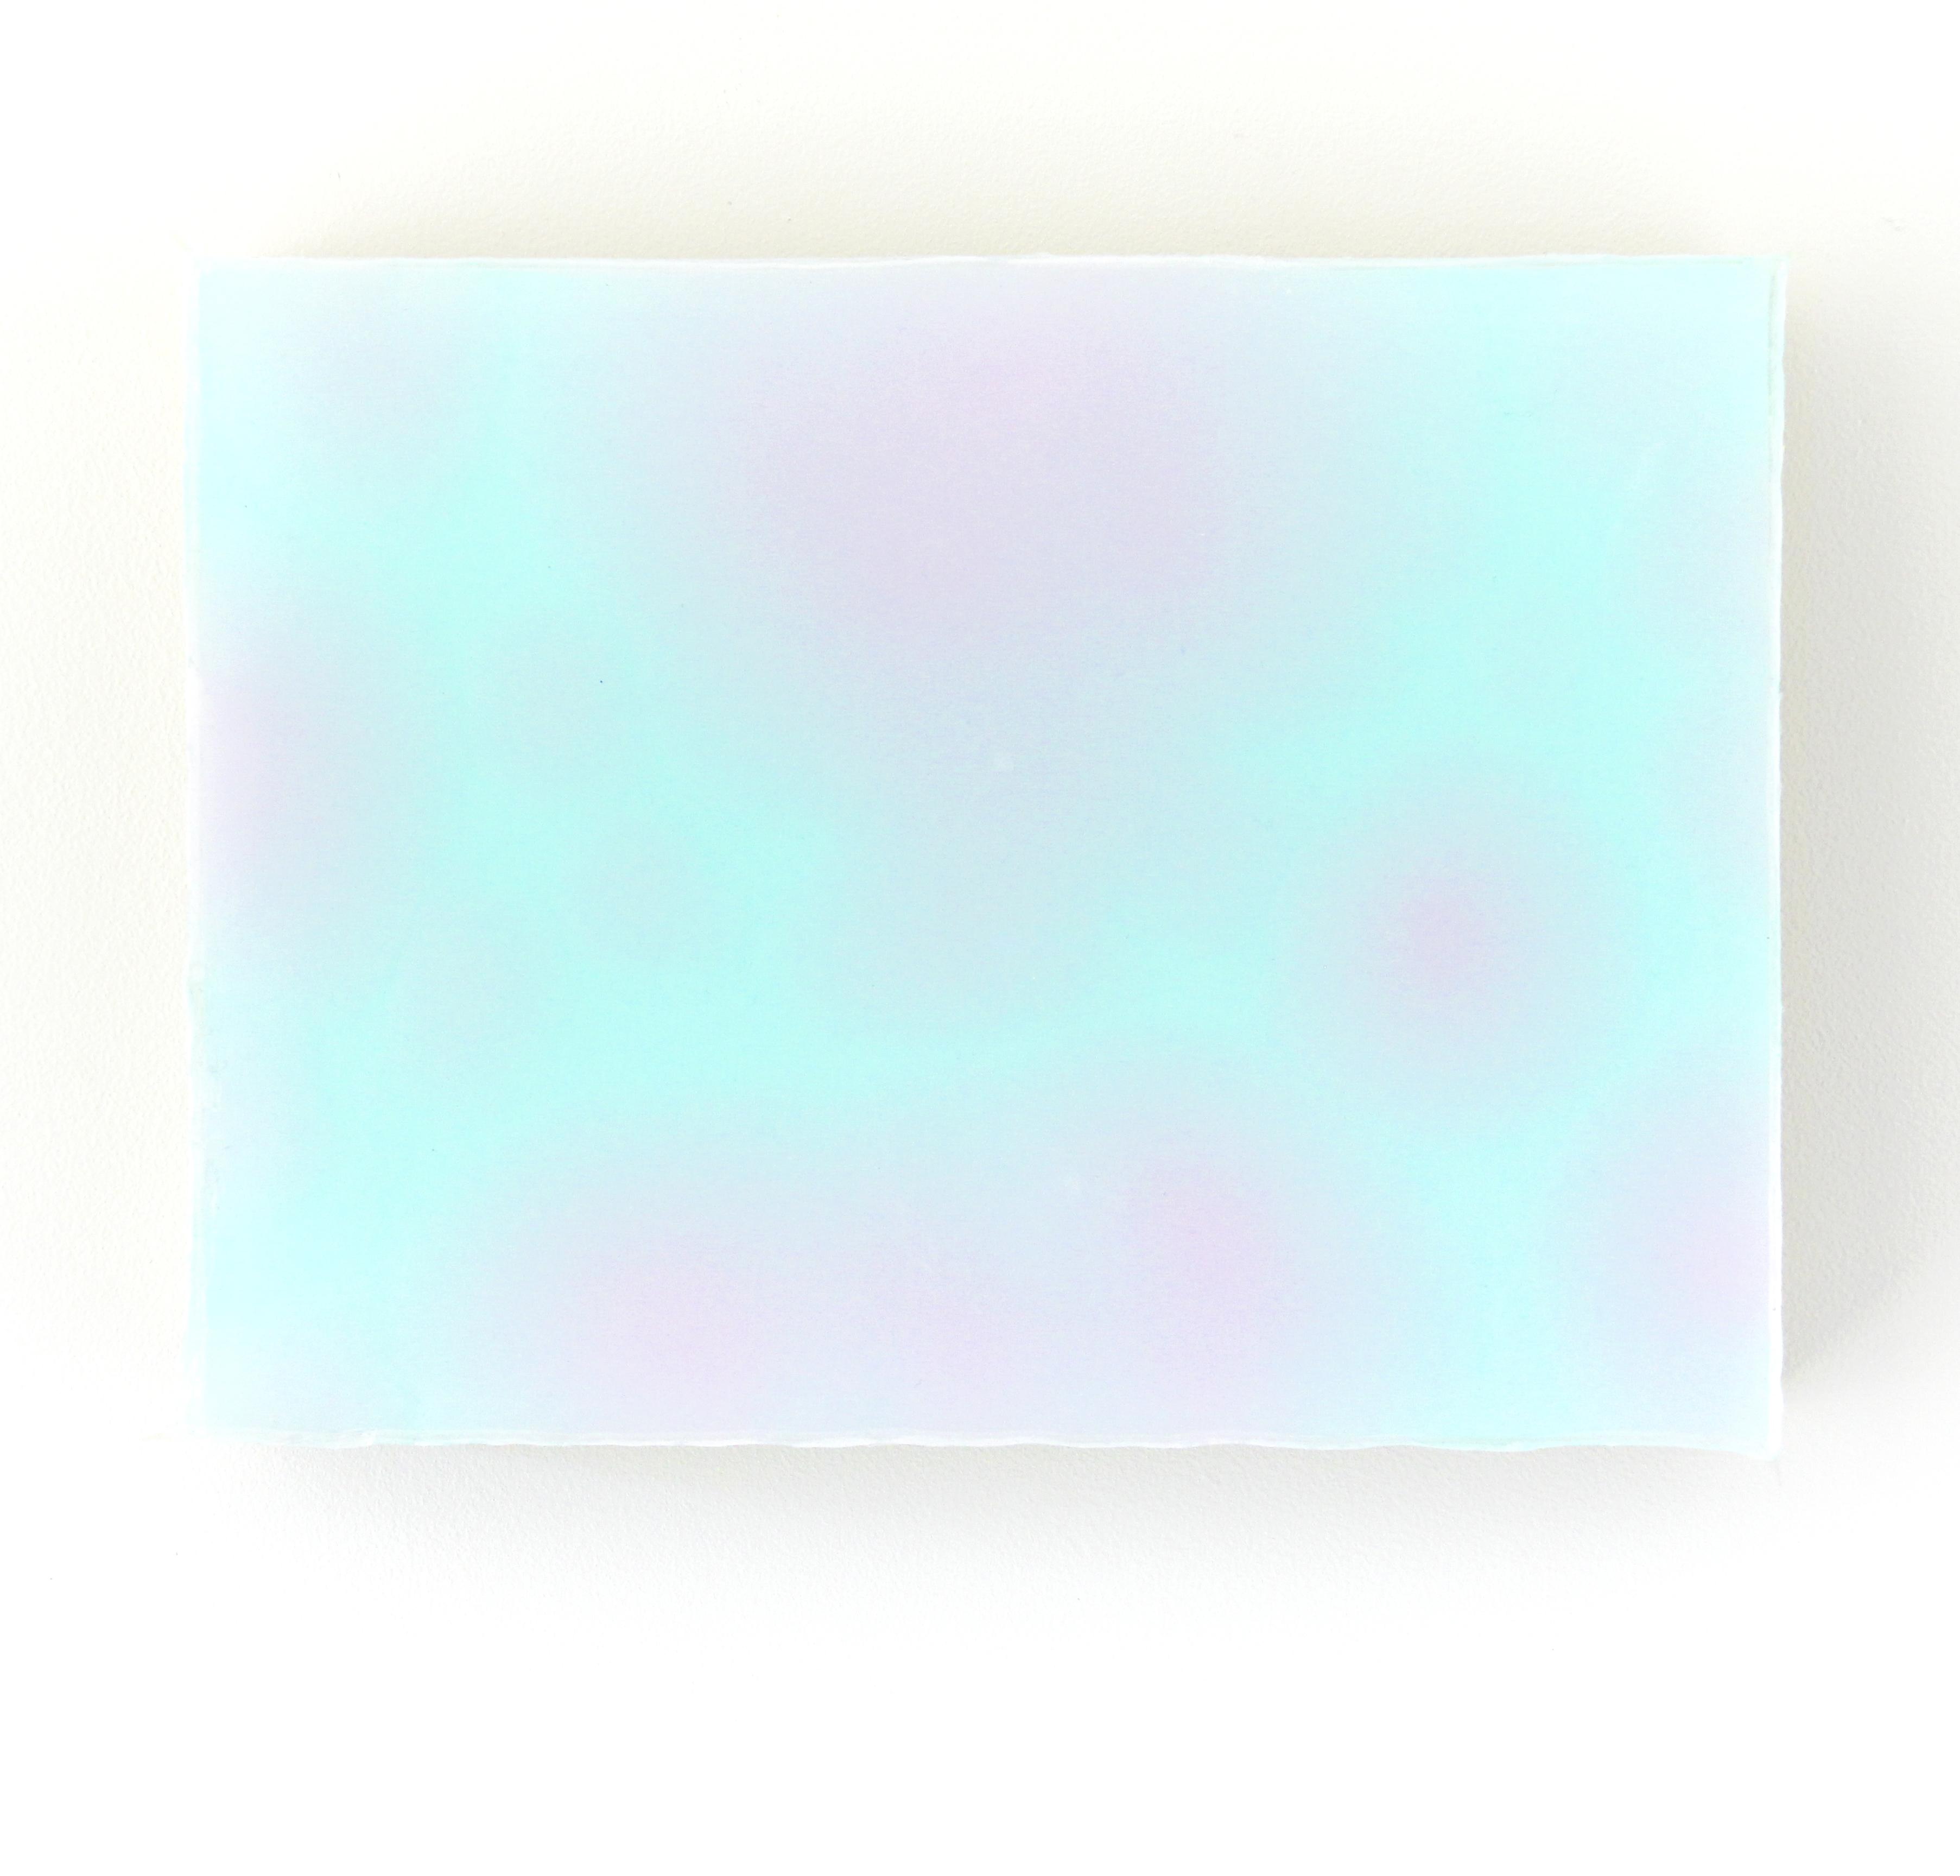 Ghost Blurs (blue, lavender)